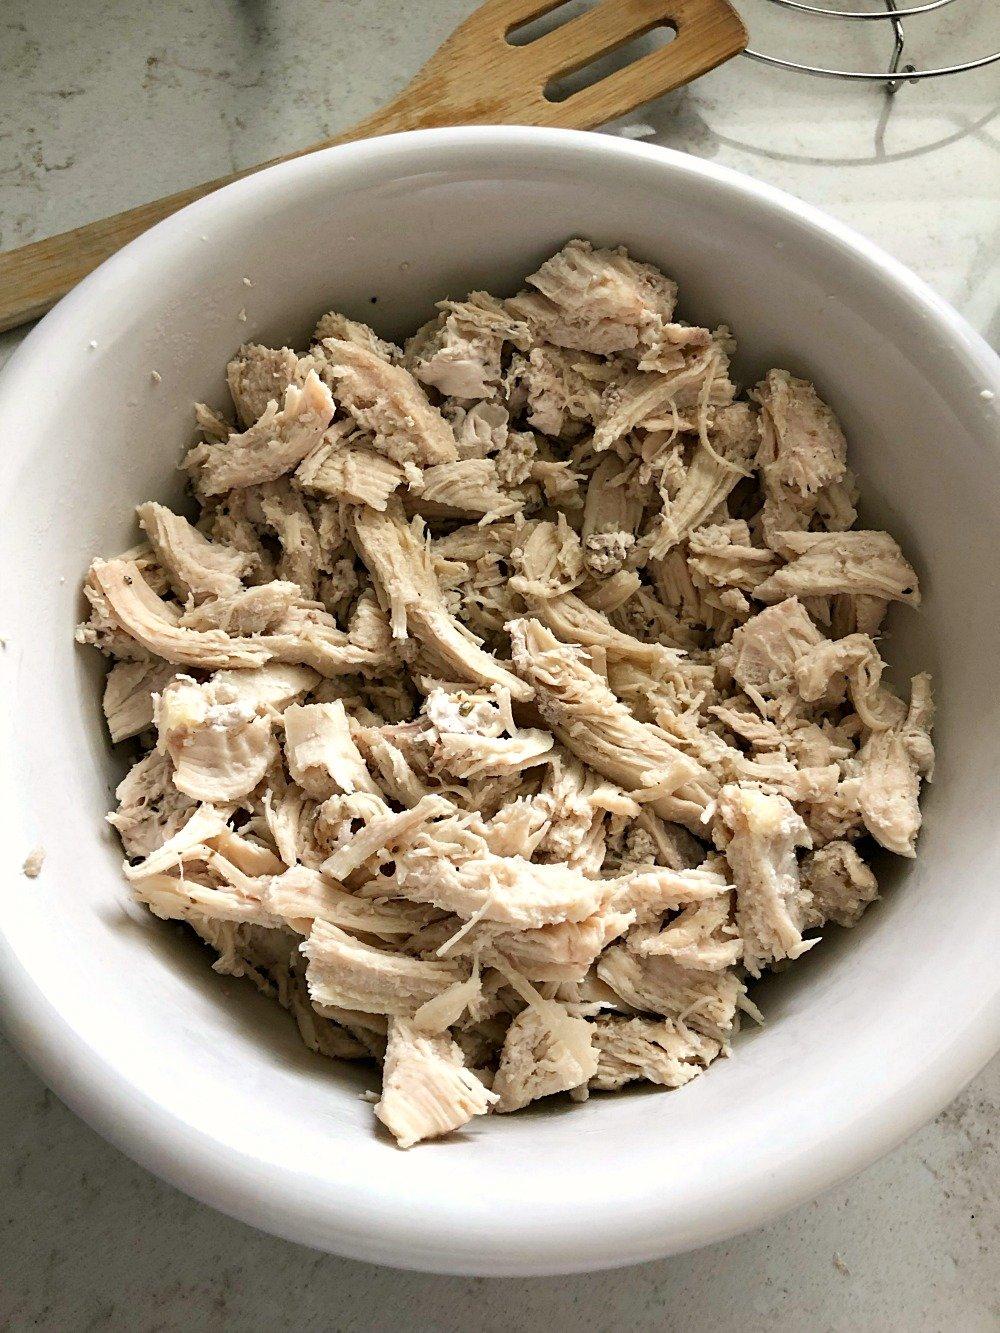 Shredded Chicken in a white bowl